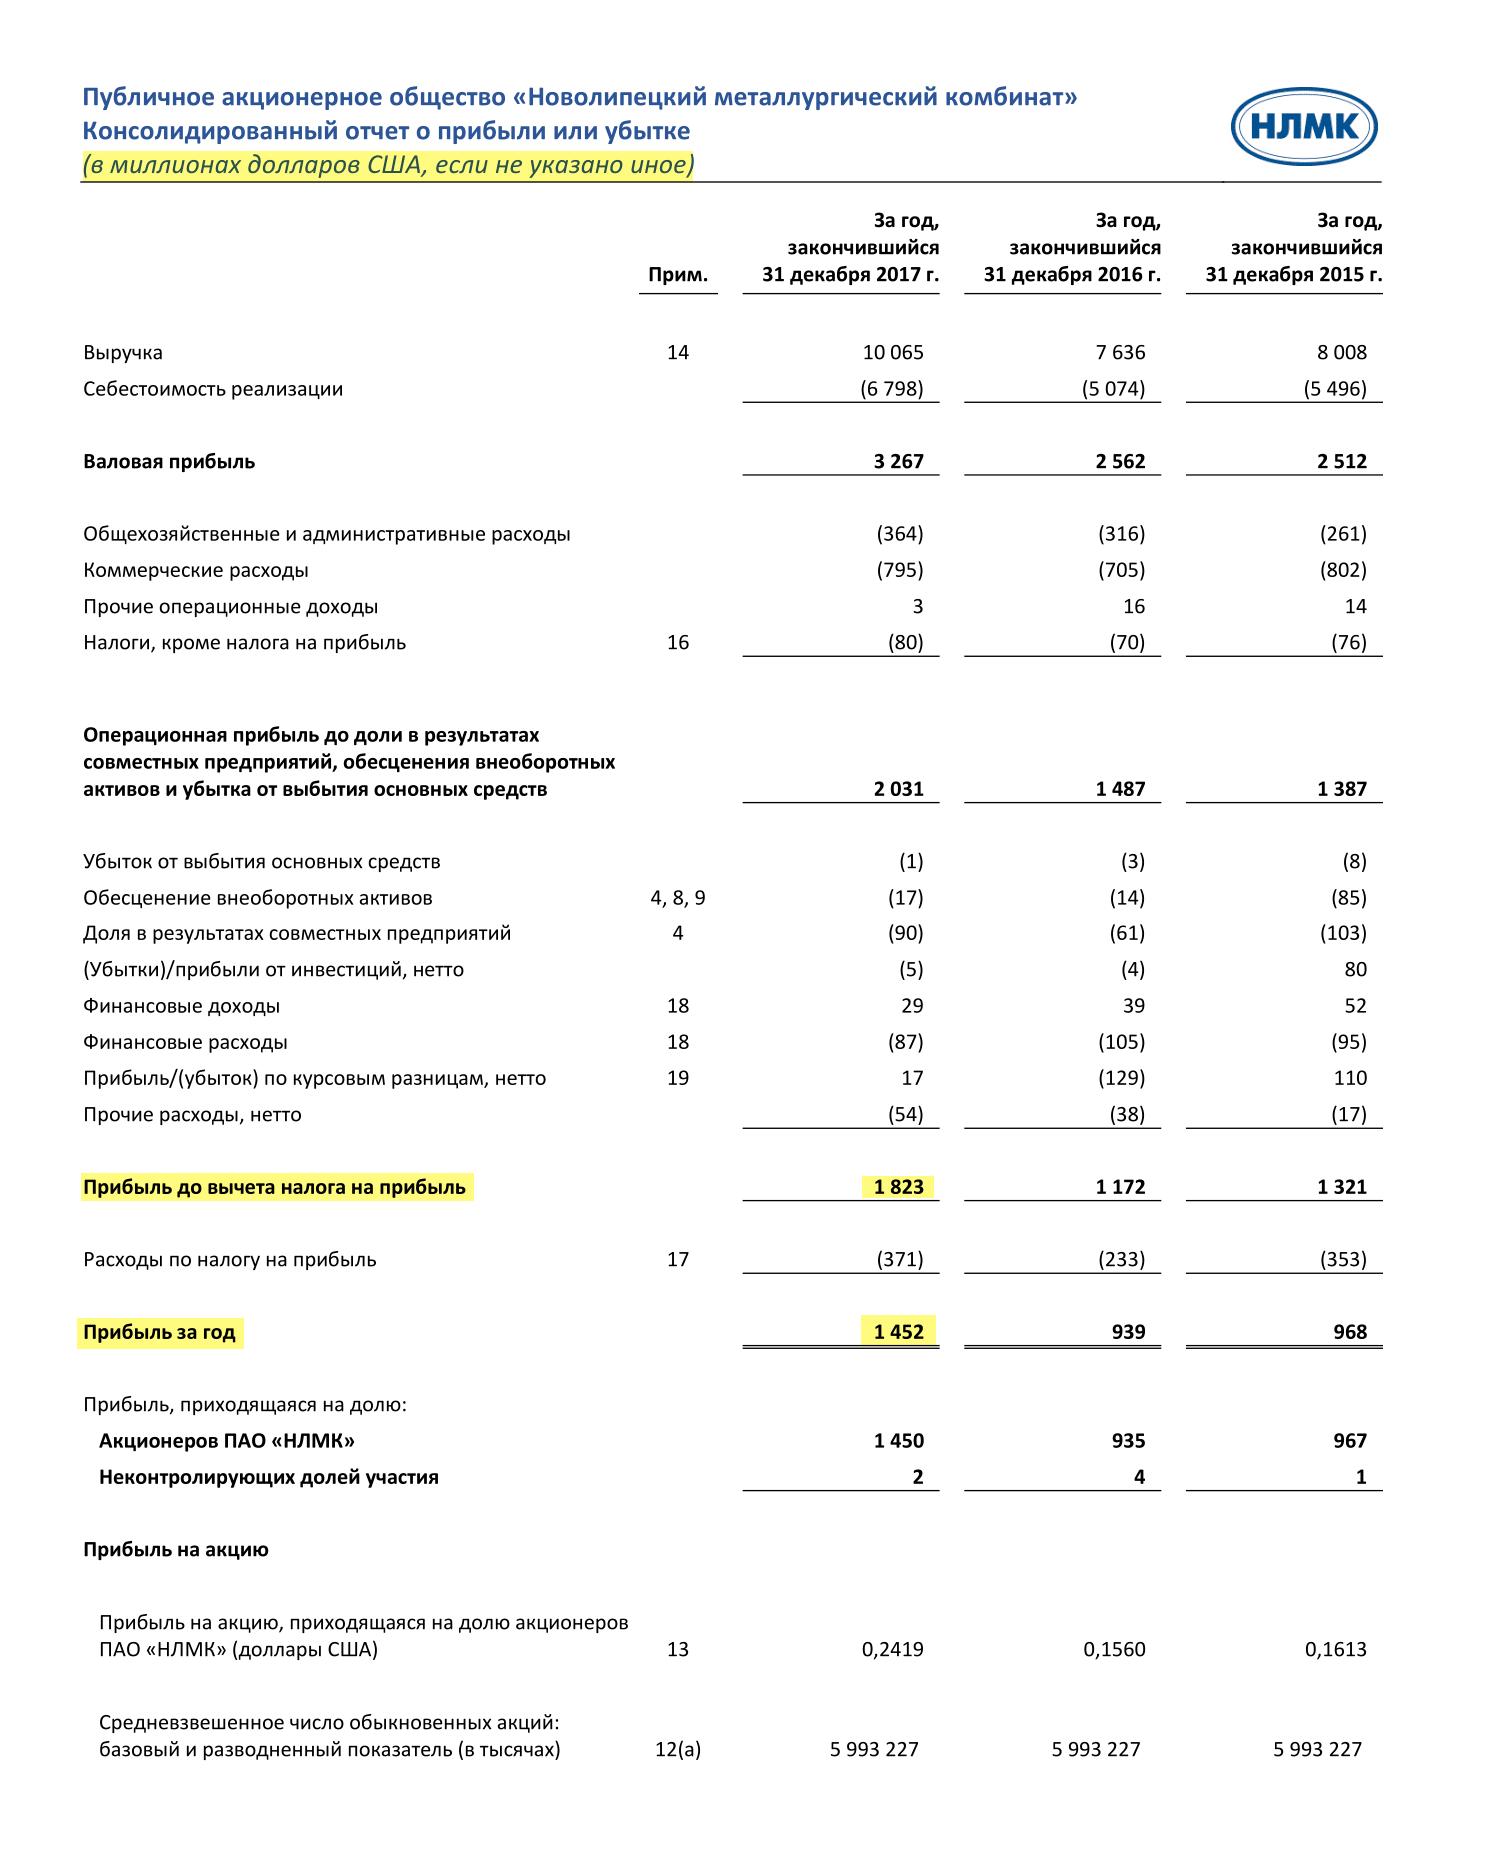 Страница 14 отчета НЛМК по итогам 2017 года